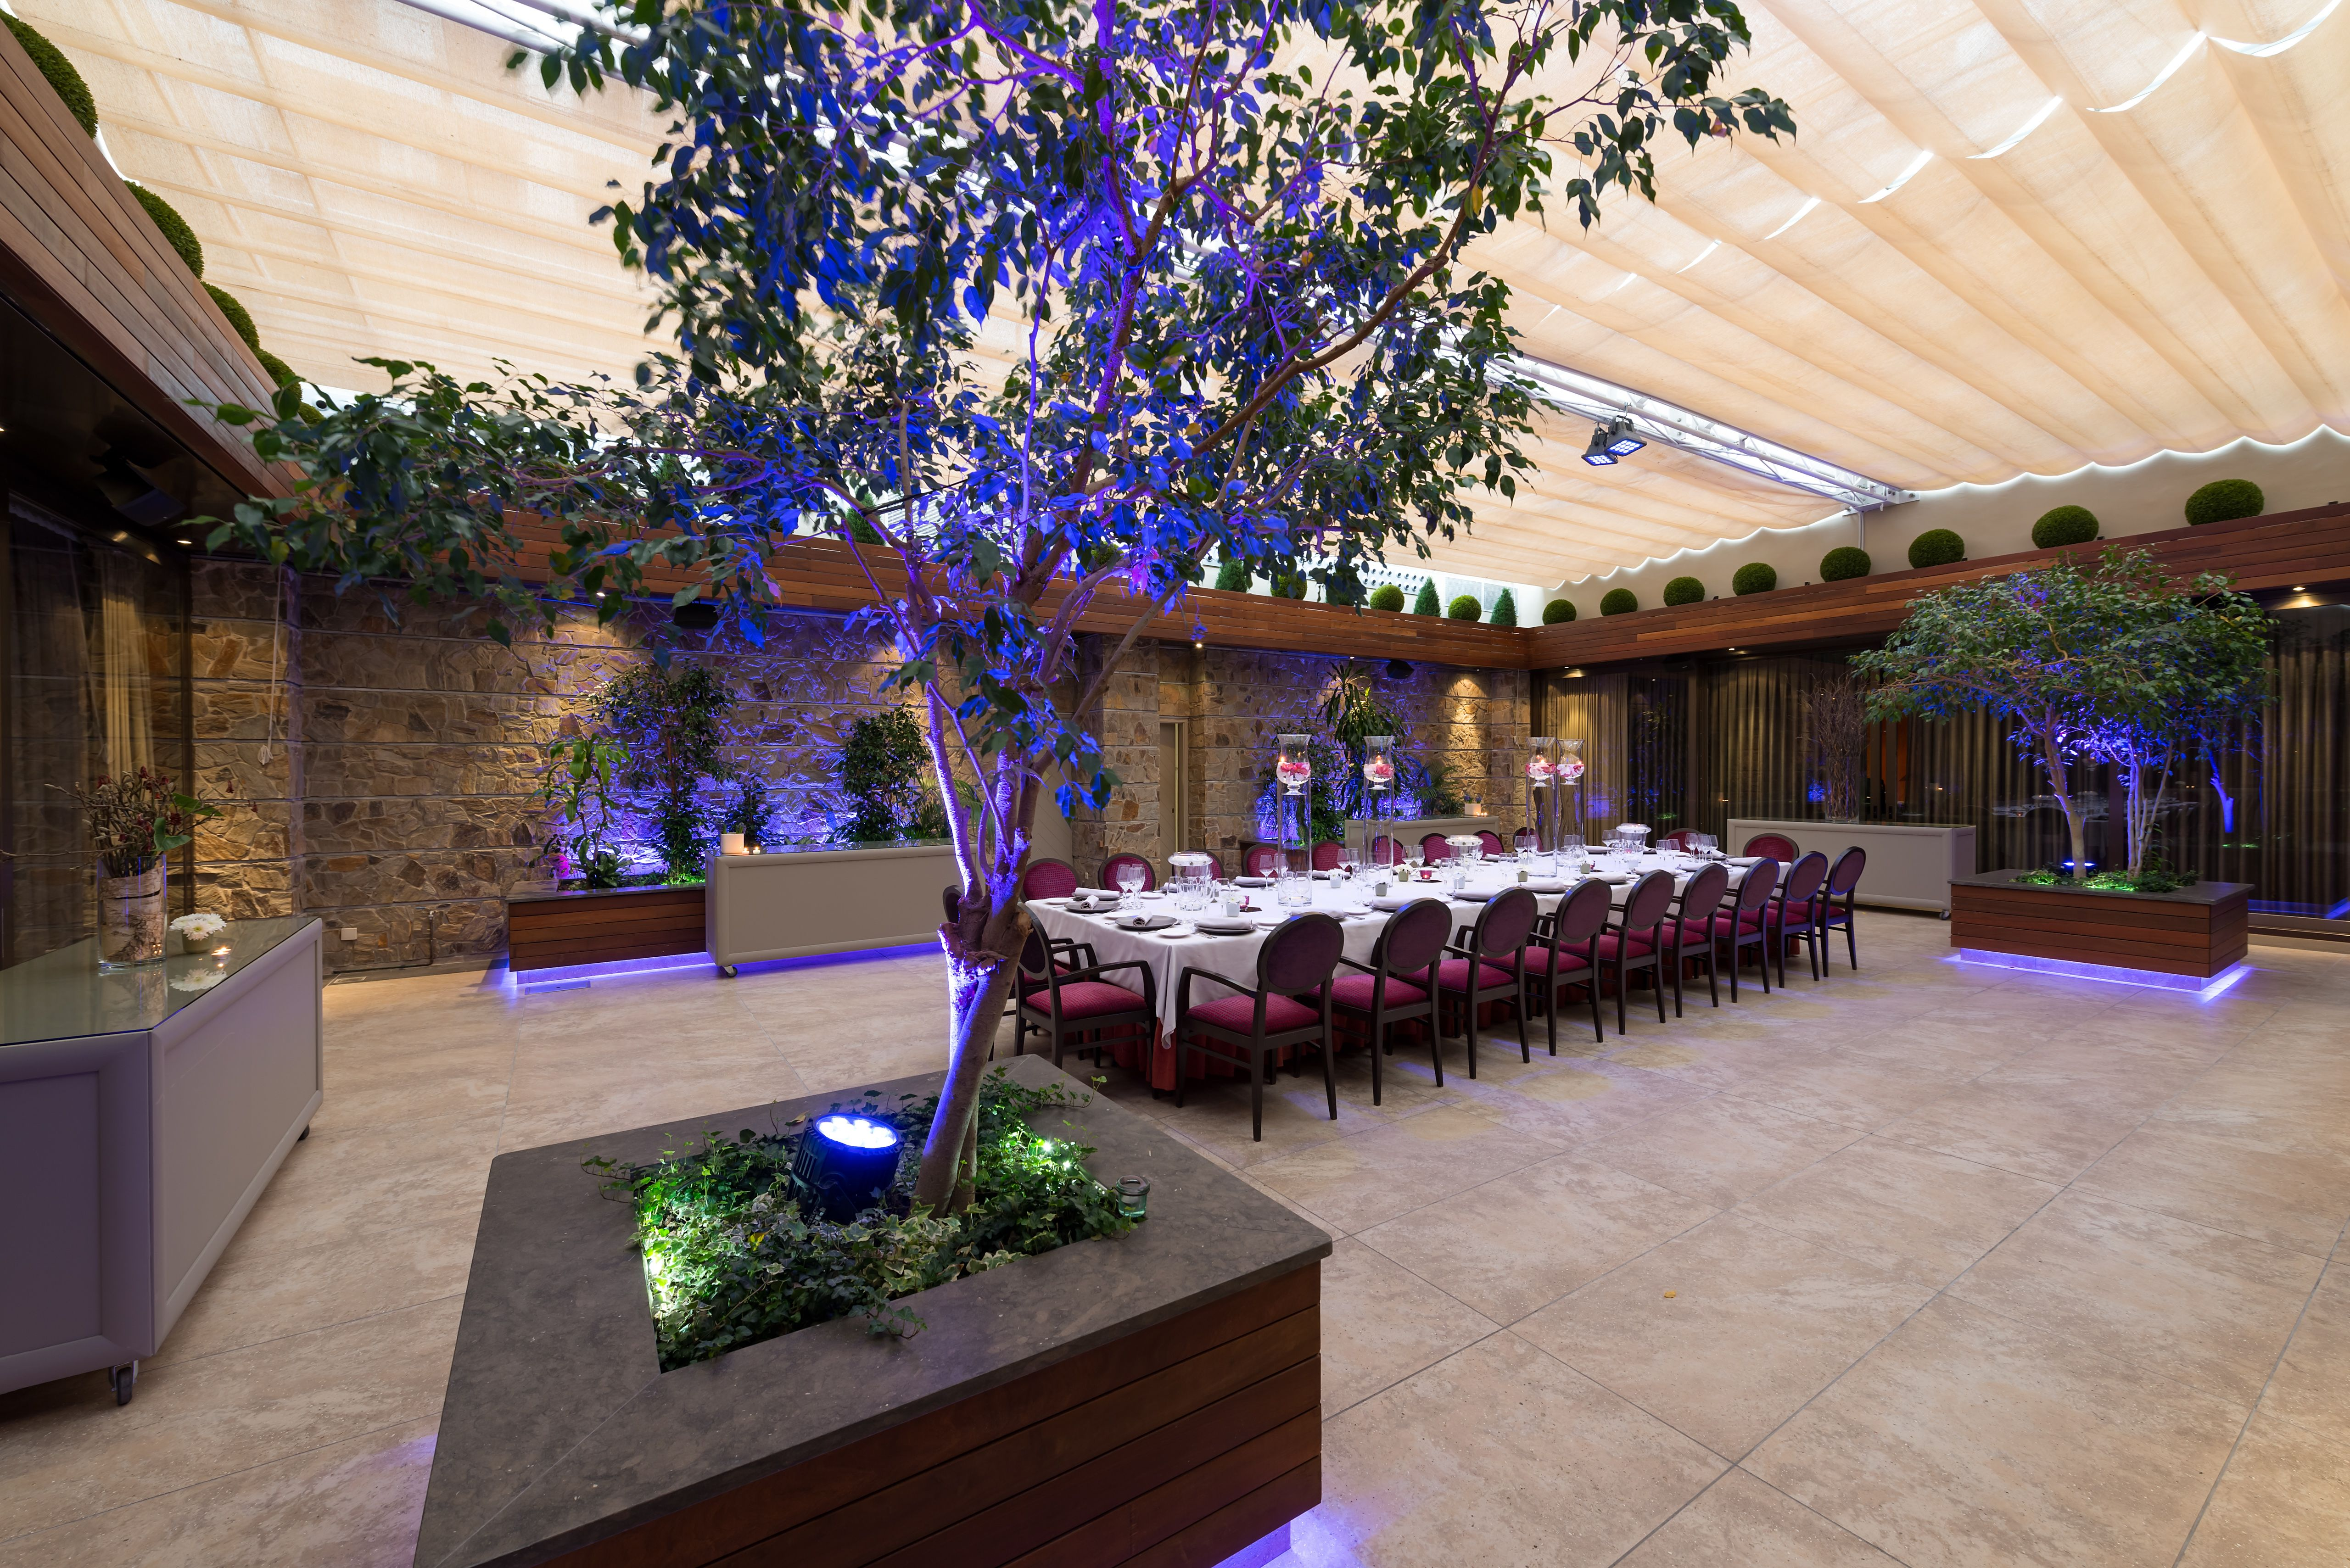 Hotel crowne plaza barcelona jard n montado para banquete for Hotel jardin barcelona